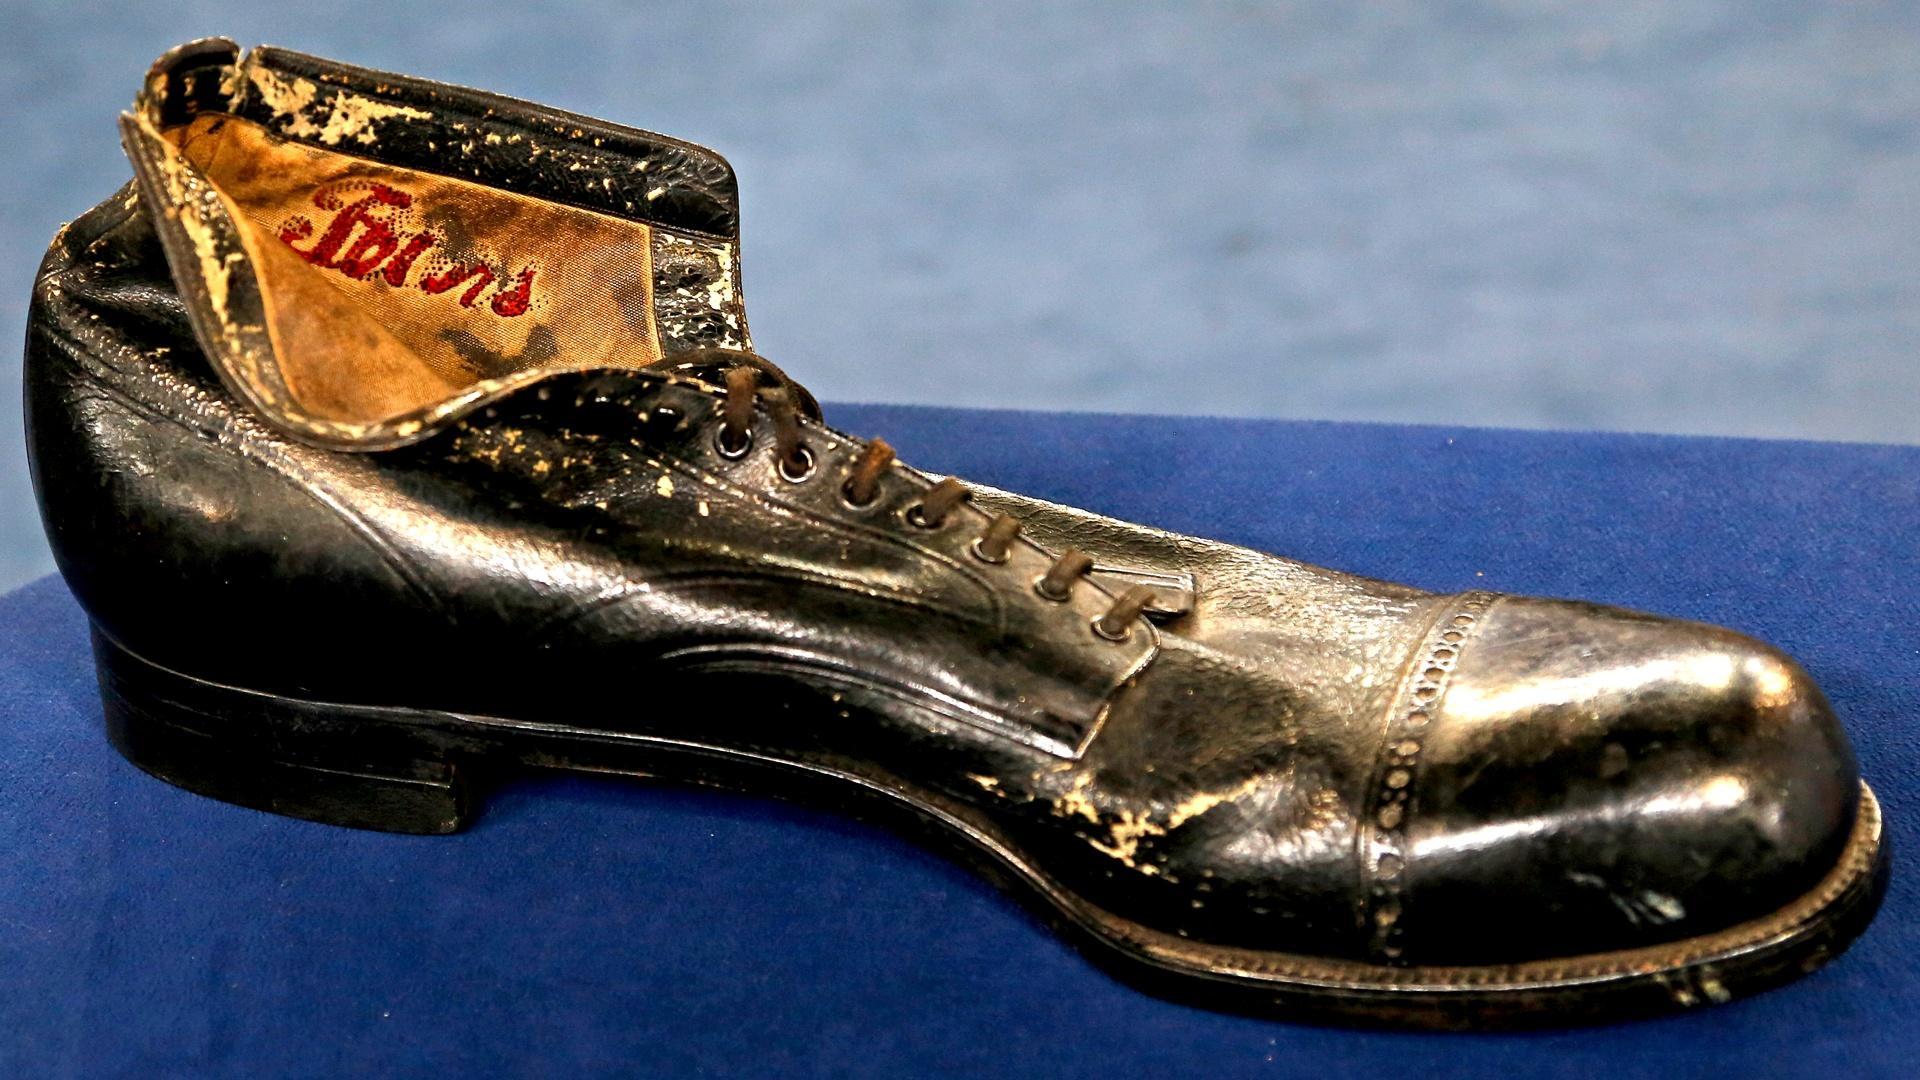 Antiques Roadshow - Appraisal: Robert Wadlow's Custom Shoe, ca. 1934 - Twin Cities PBS